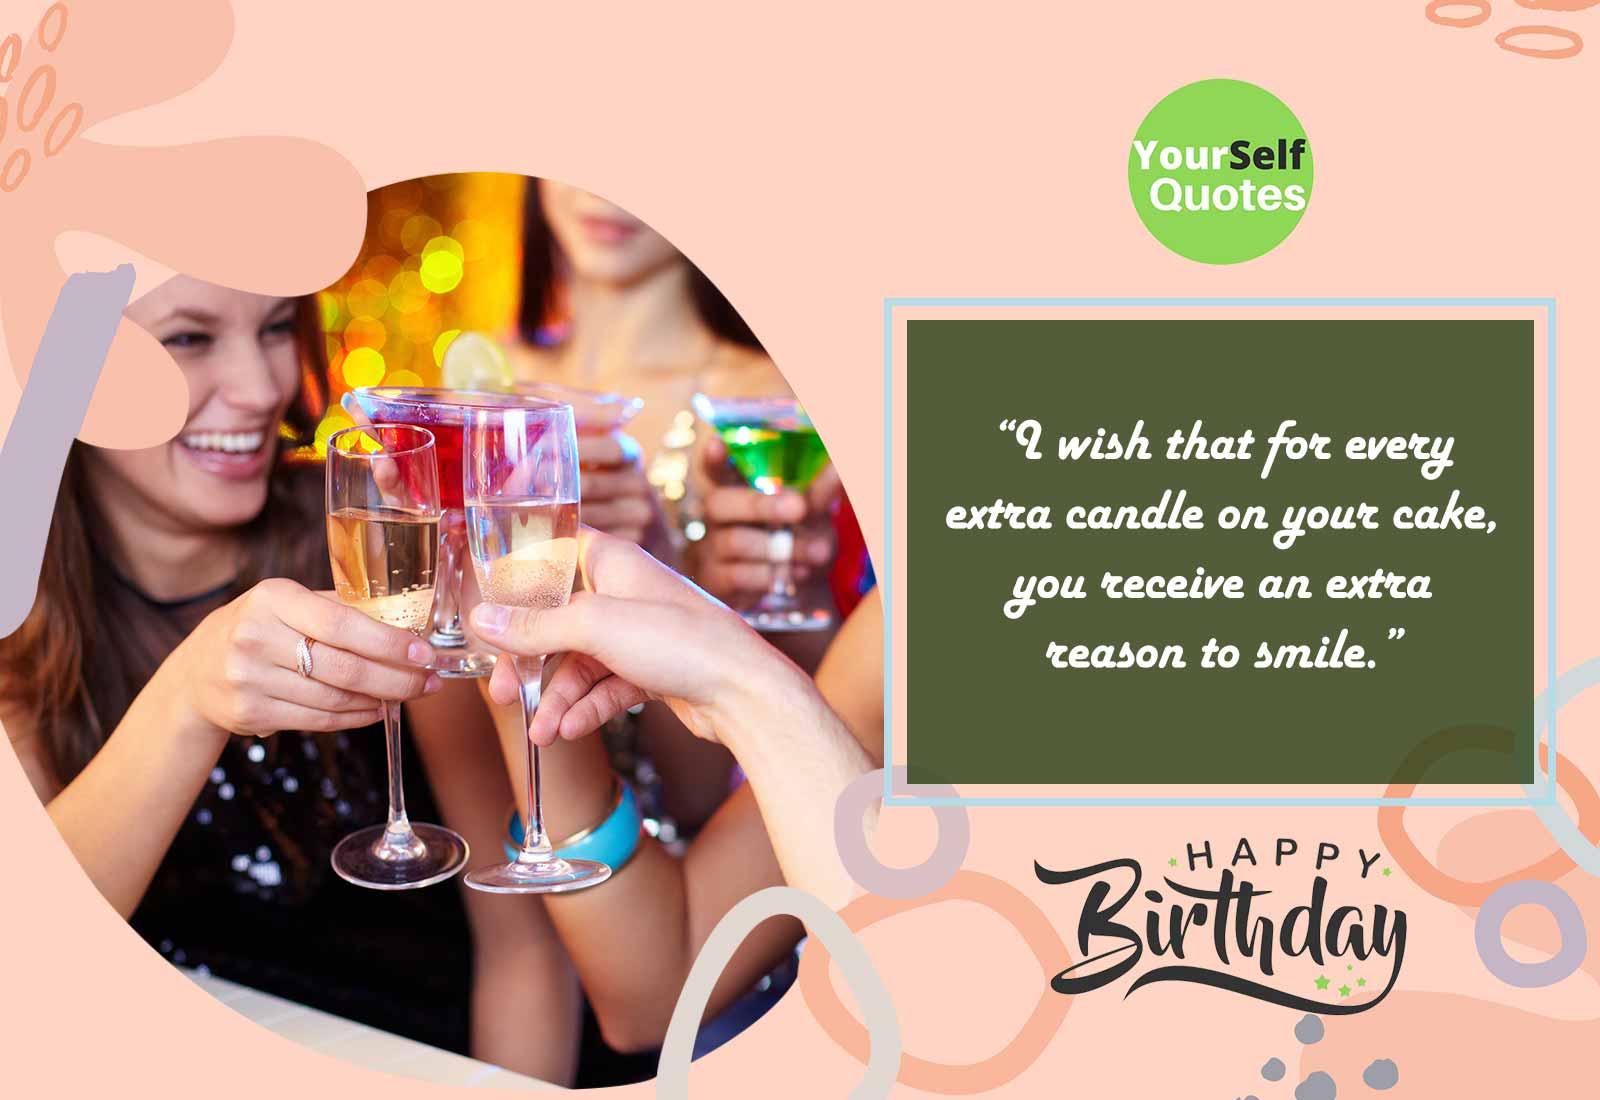 Wishing a Very Happy Birthday You